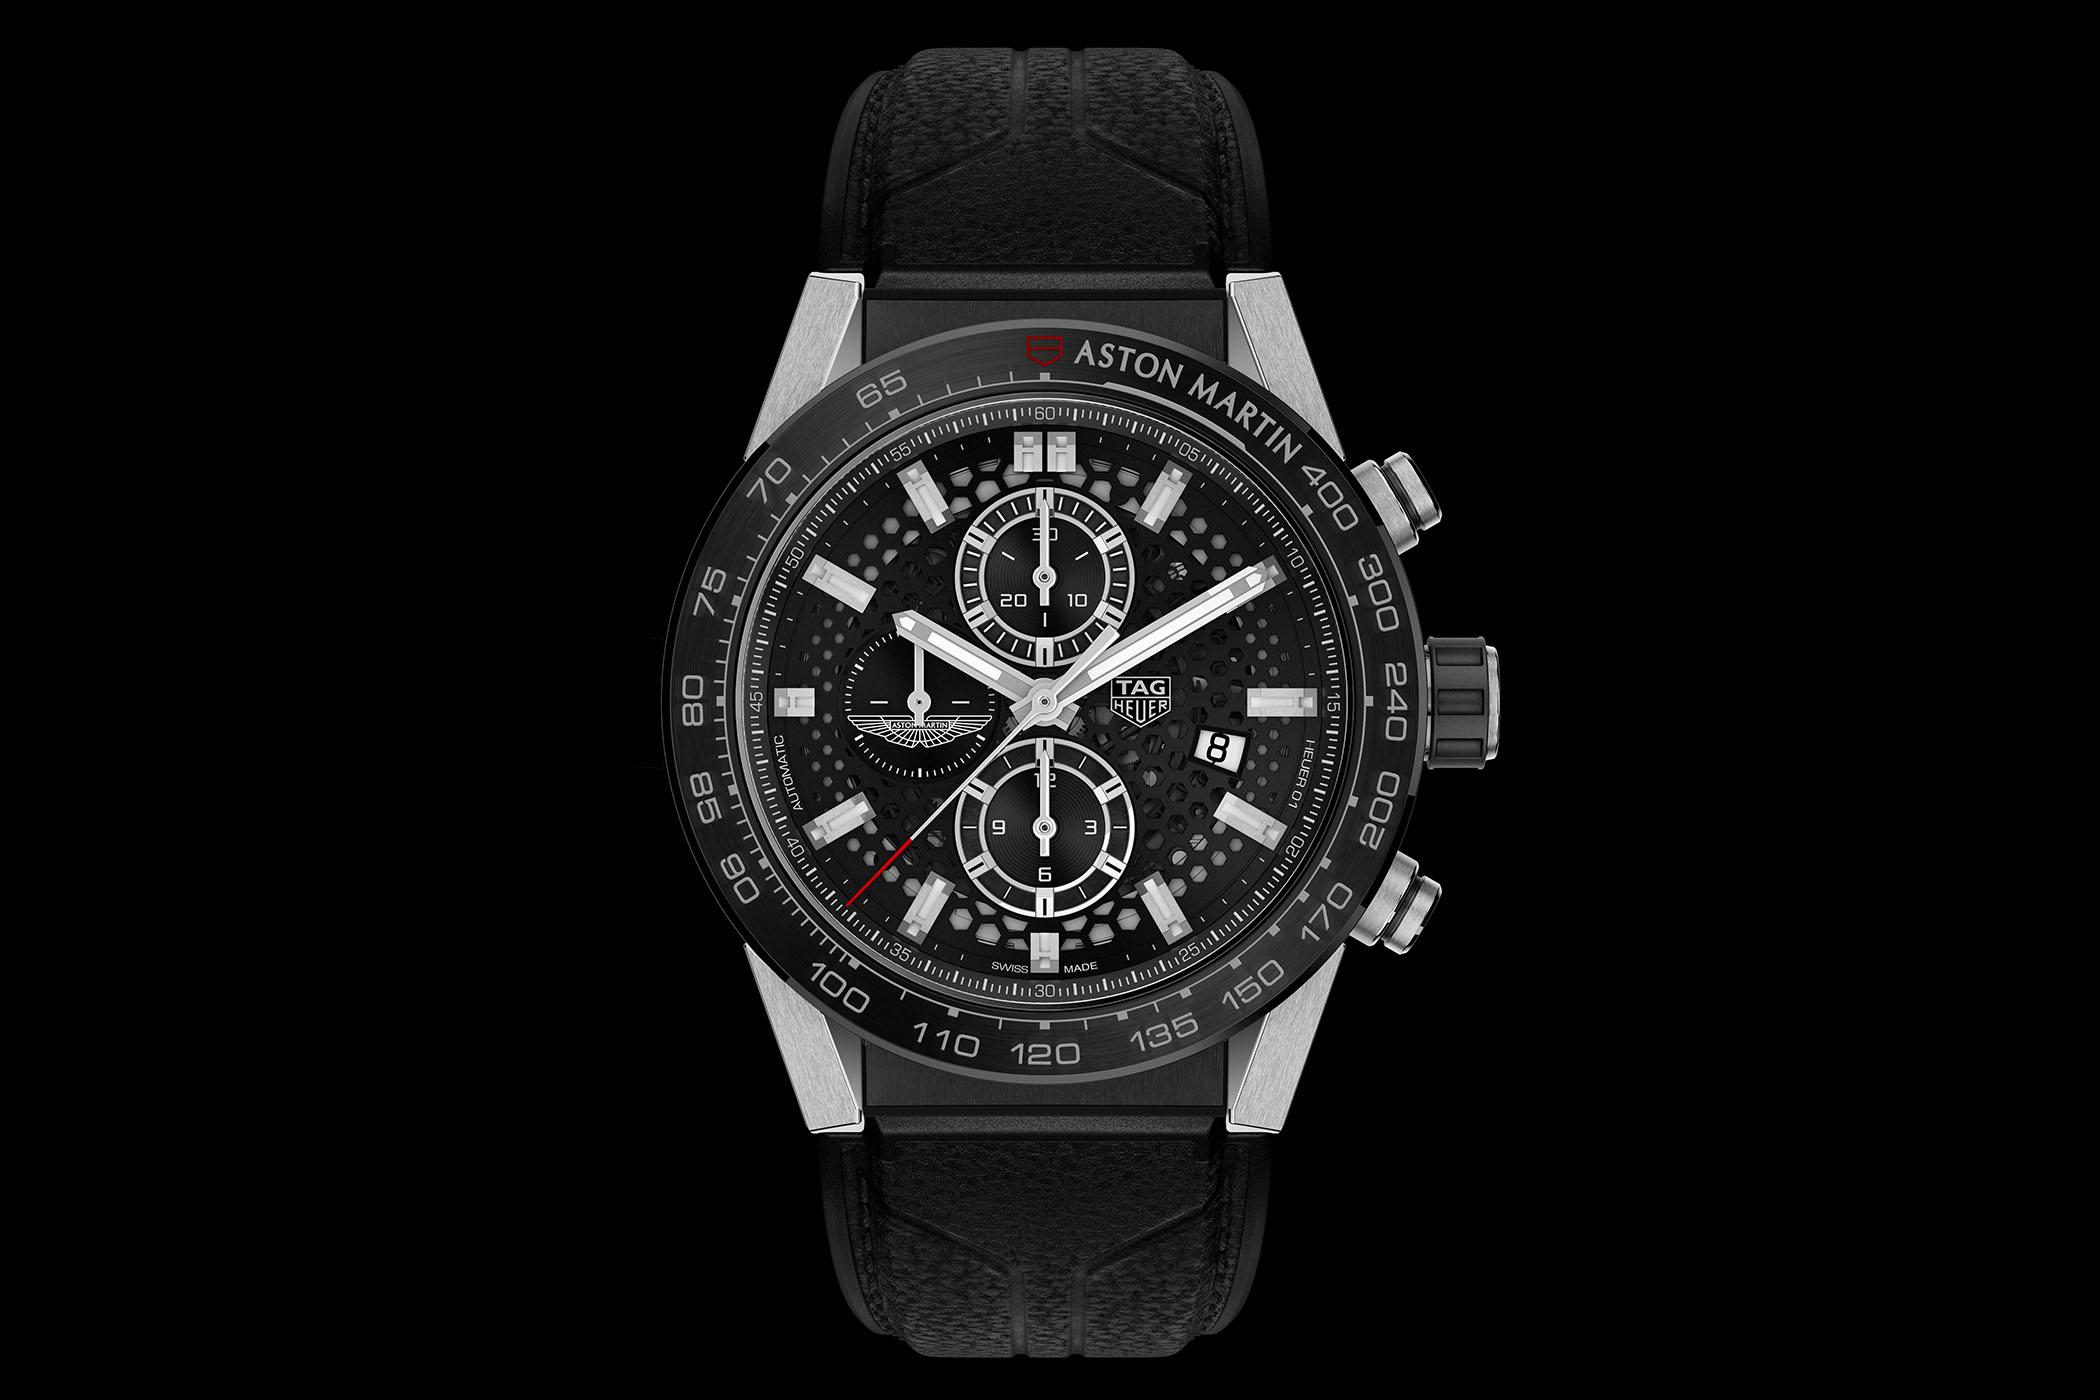 Aston Martin Second Hand >> The TAG Heuer Carrera Heuer 01 Aston Martin - Monochrome Watches